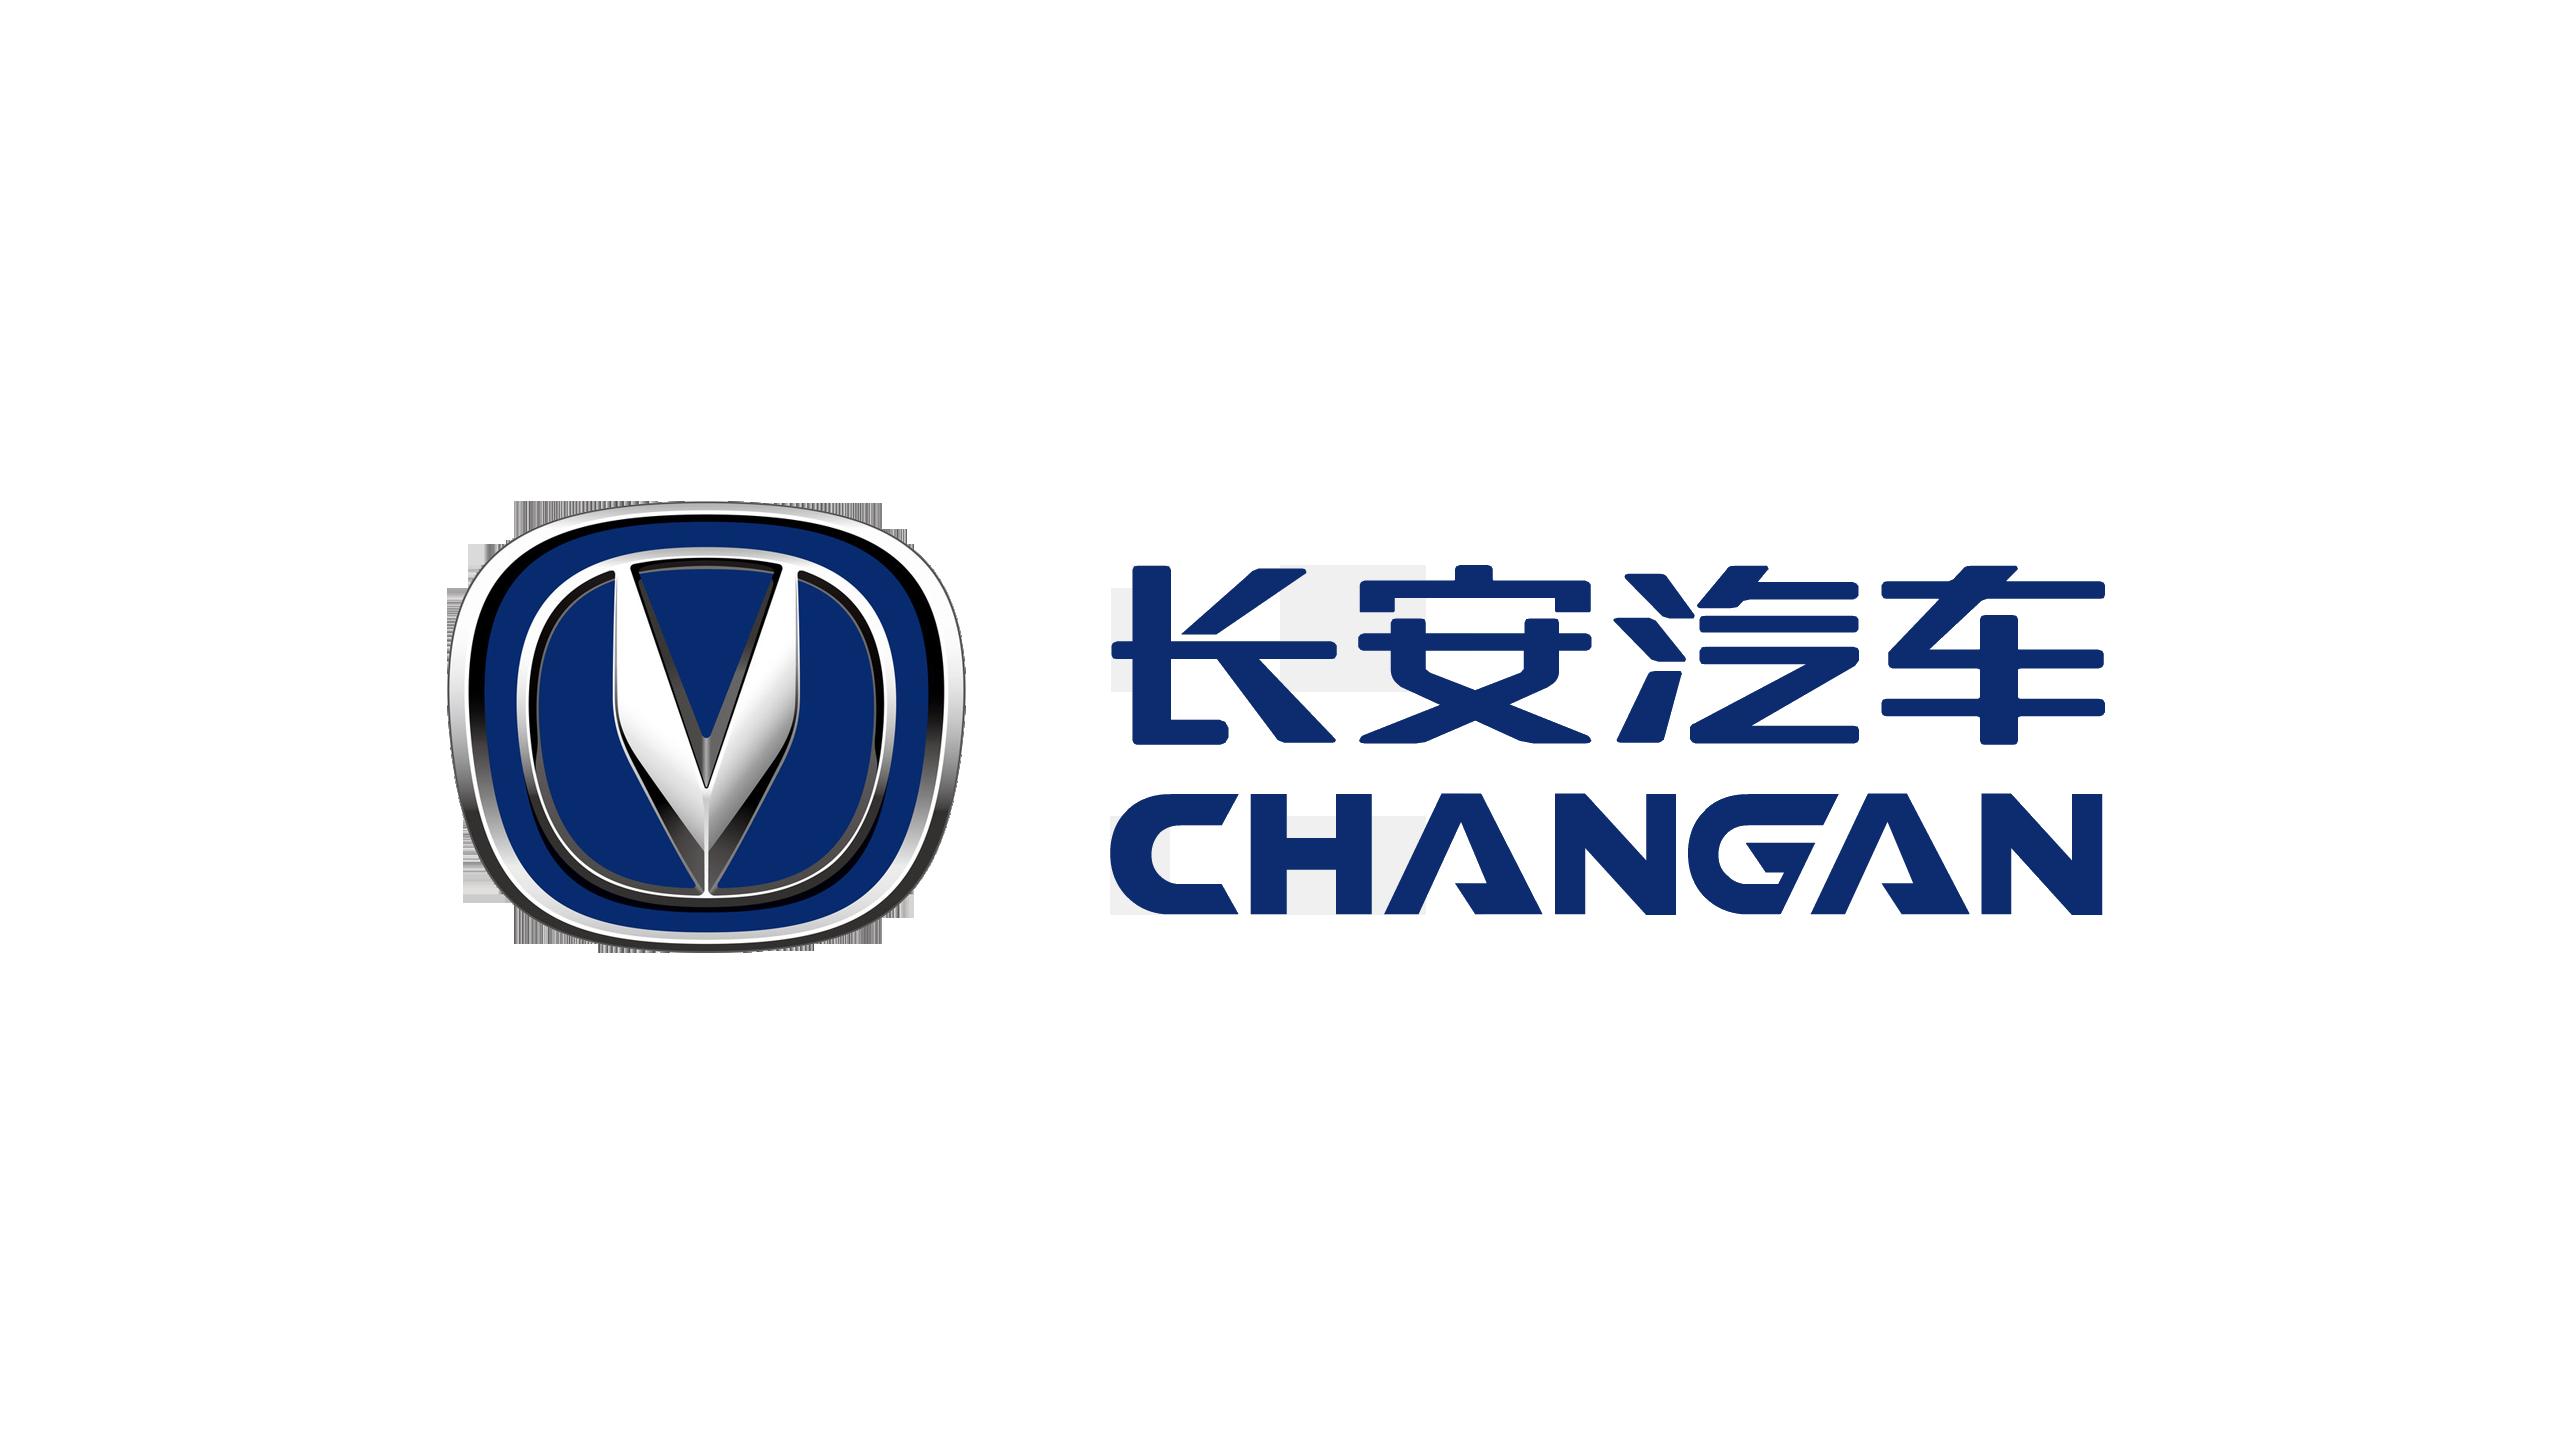 Victory Group Logo >> Changan Logo, HD Png, Meaning, Information | Carlogos.org